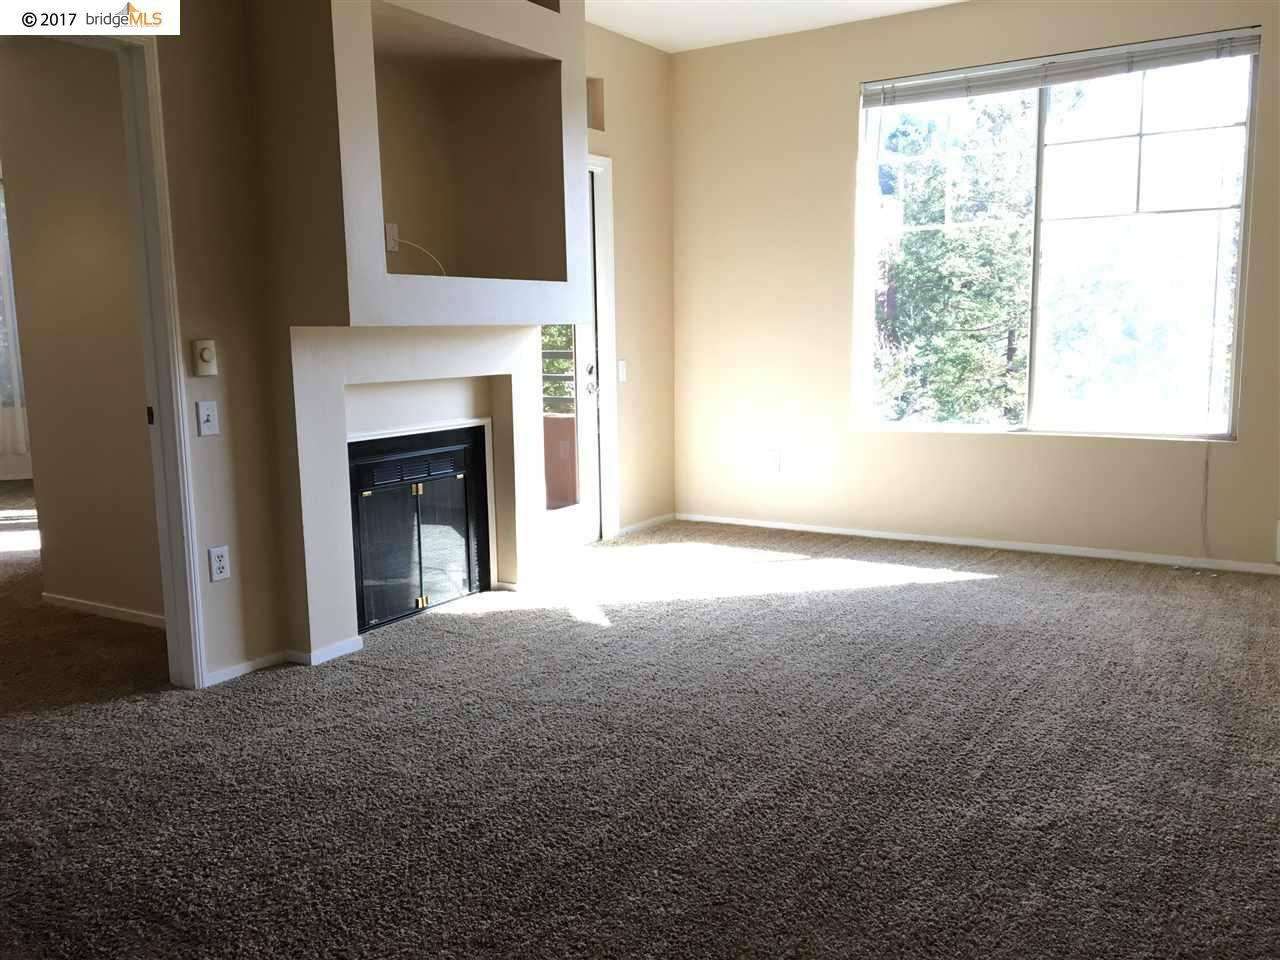 280 caldecott Lane, OAKLAND, CA 94618